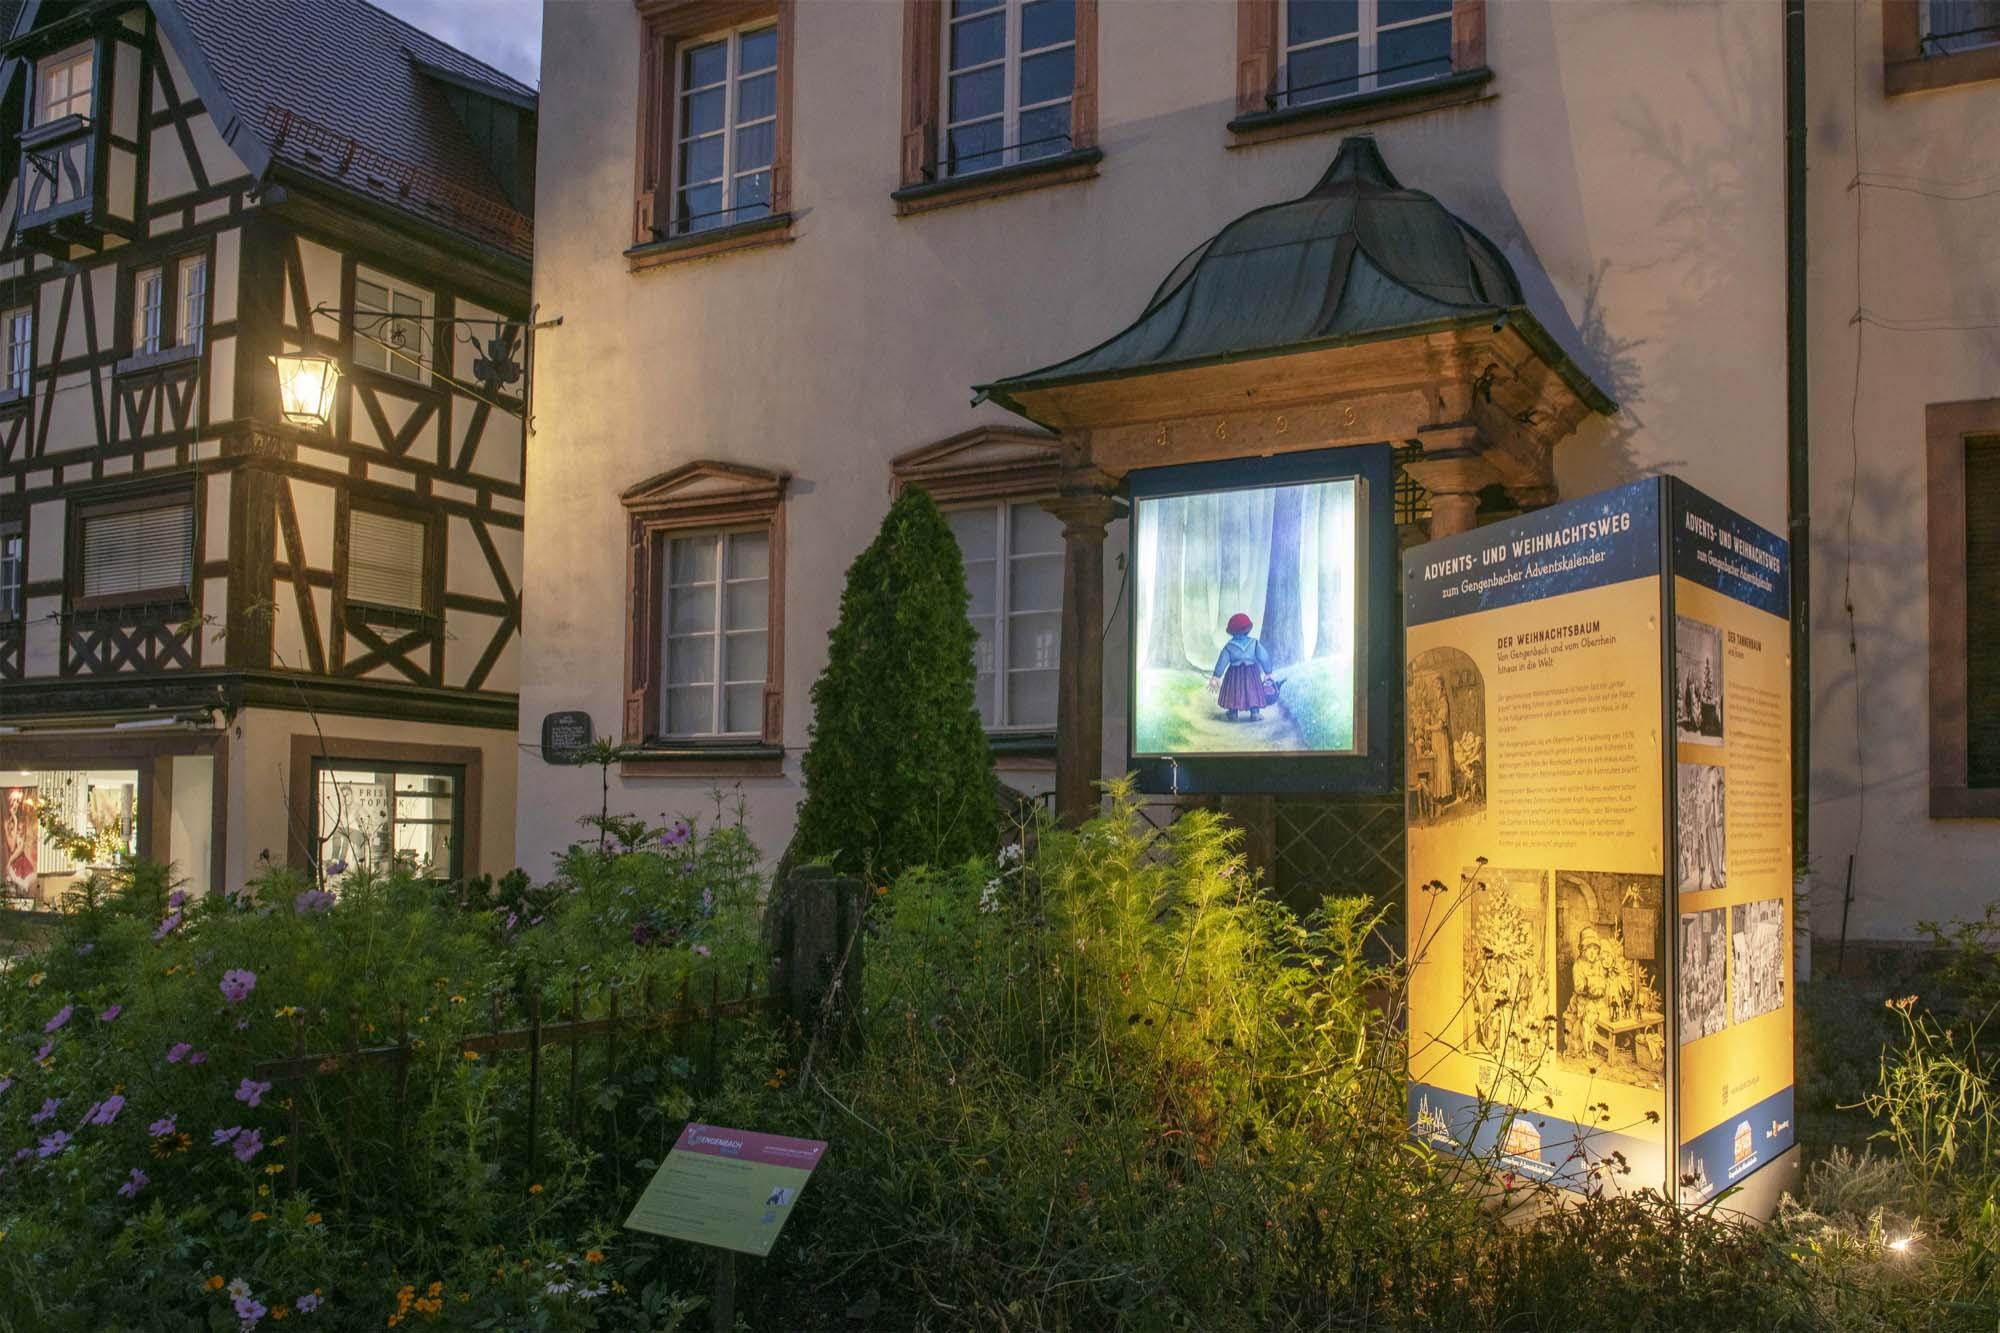 2020-11-27-GB-Gengenbach-Stadt-Adventsweg Gengenbach Ratskanzlei Foto D. Wissing